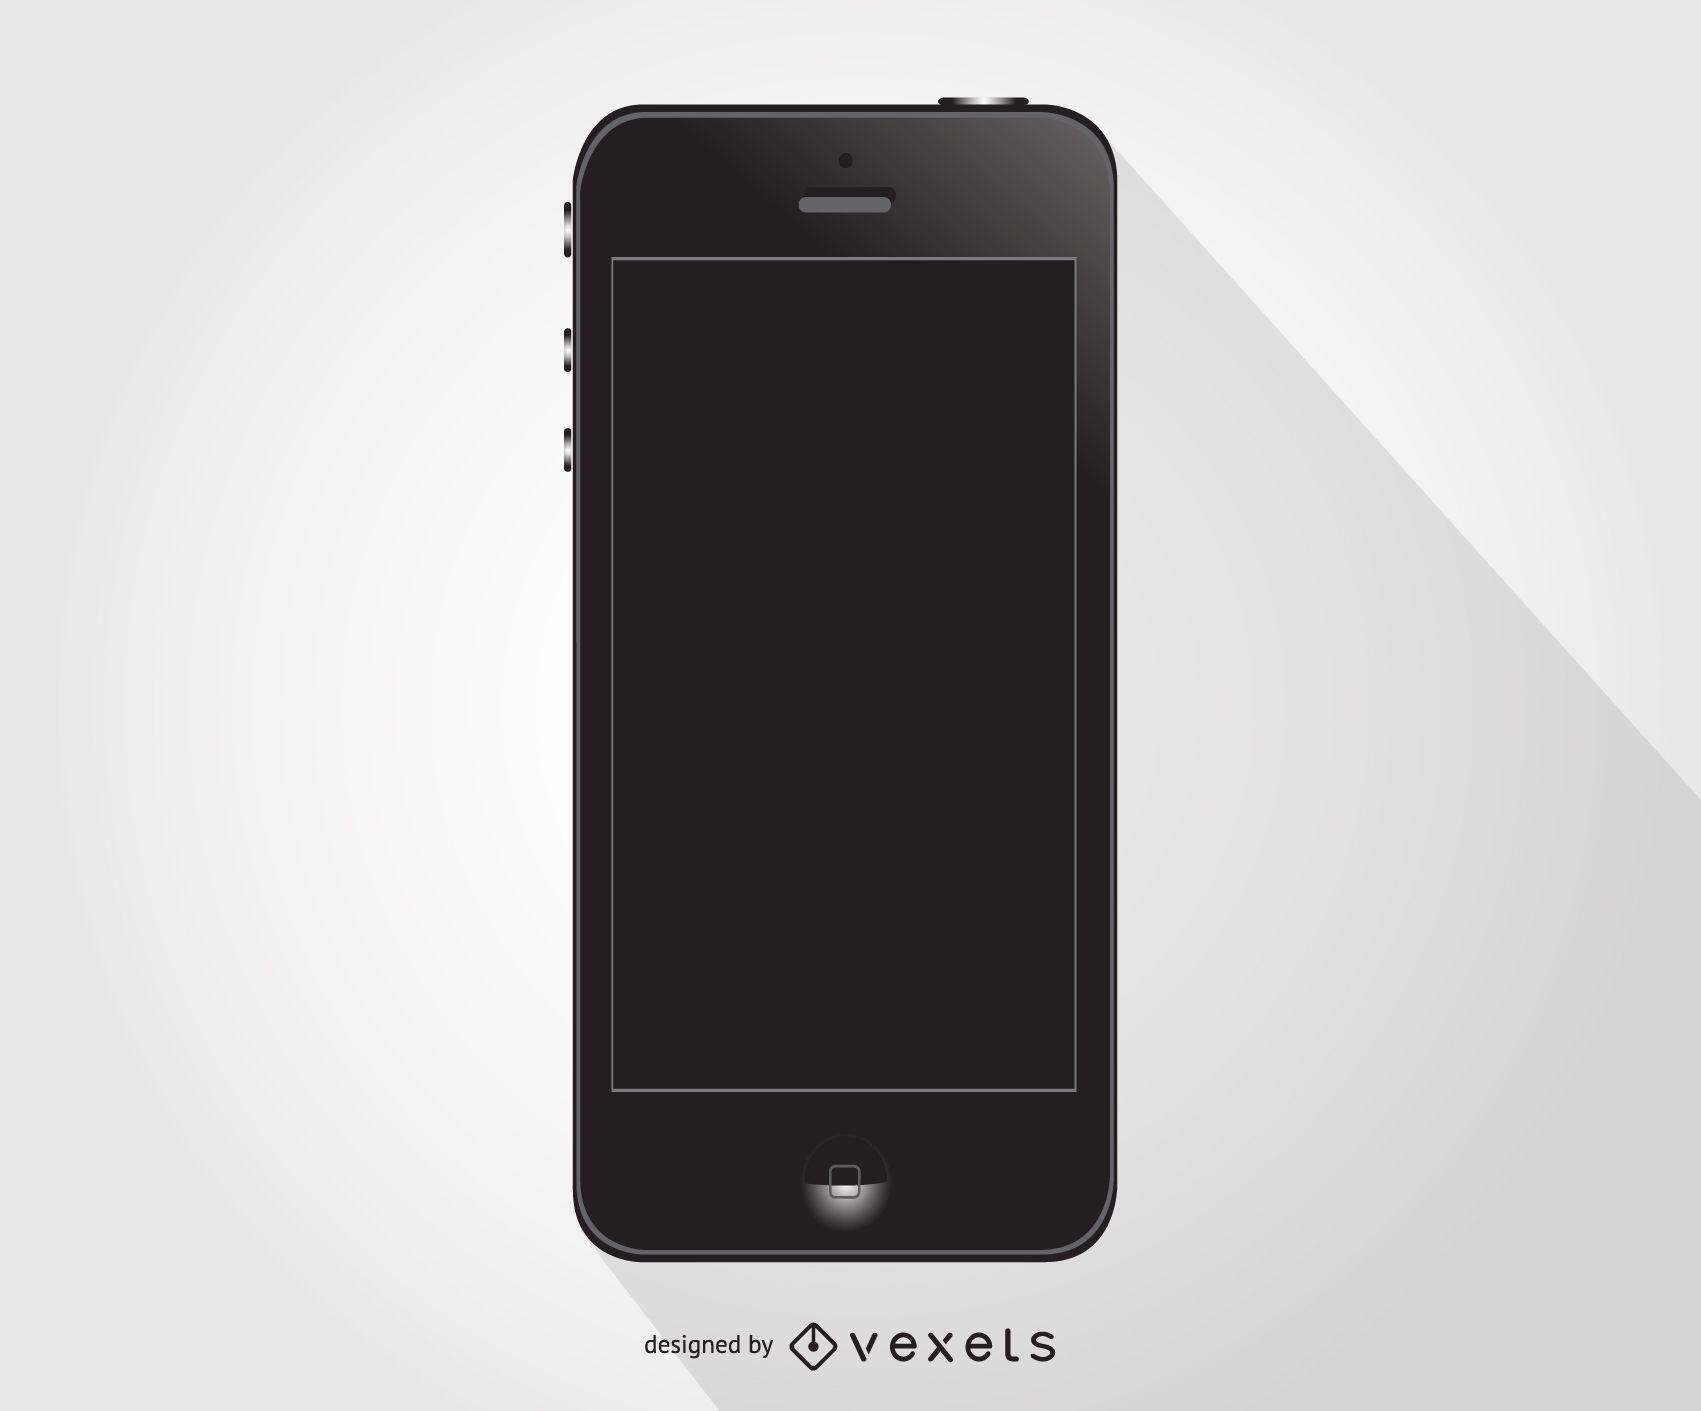 Iphone smartphone black